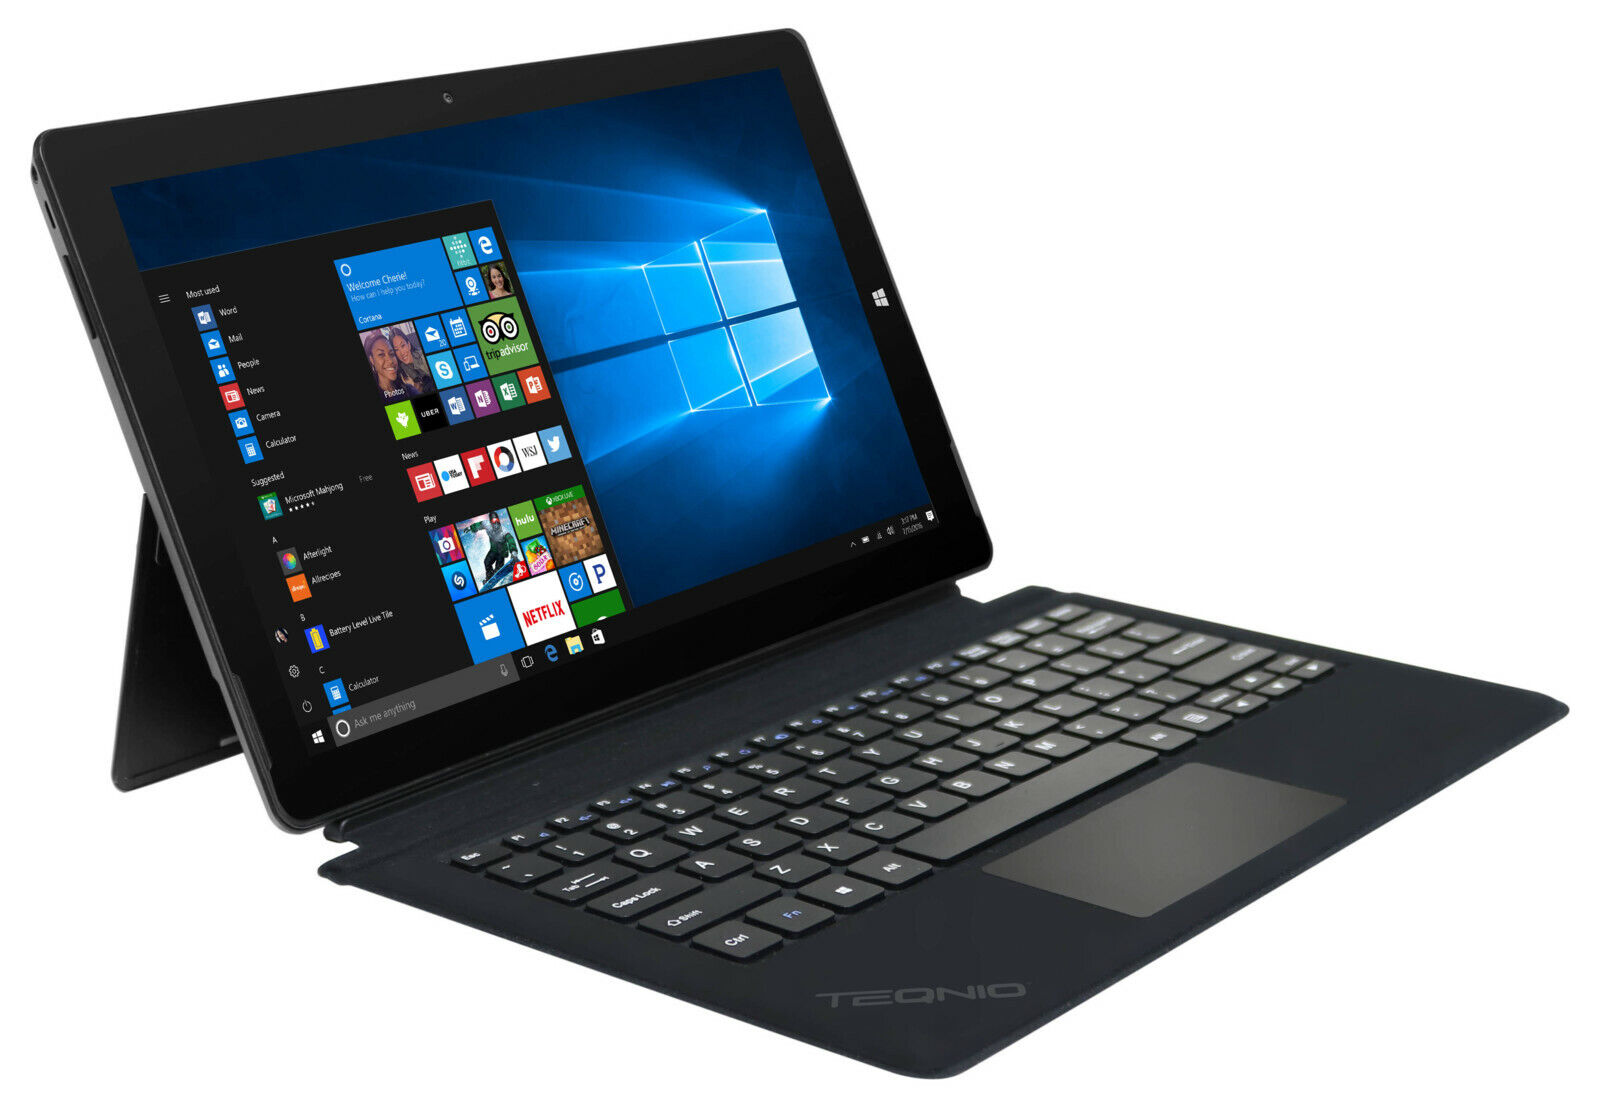 "Teqnio 11.6"" Tablet with Keyboard, Windows 10, 32GB Storage,"